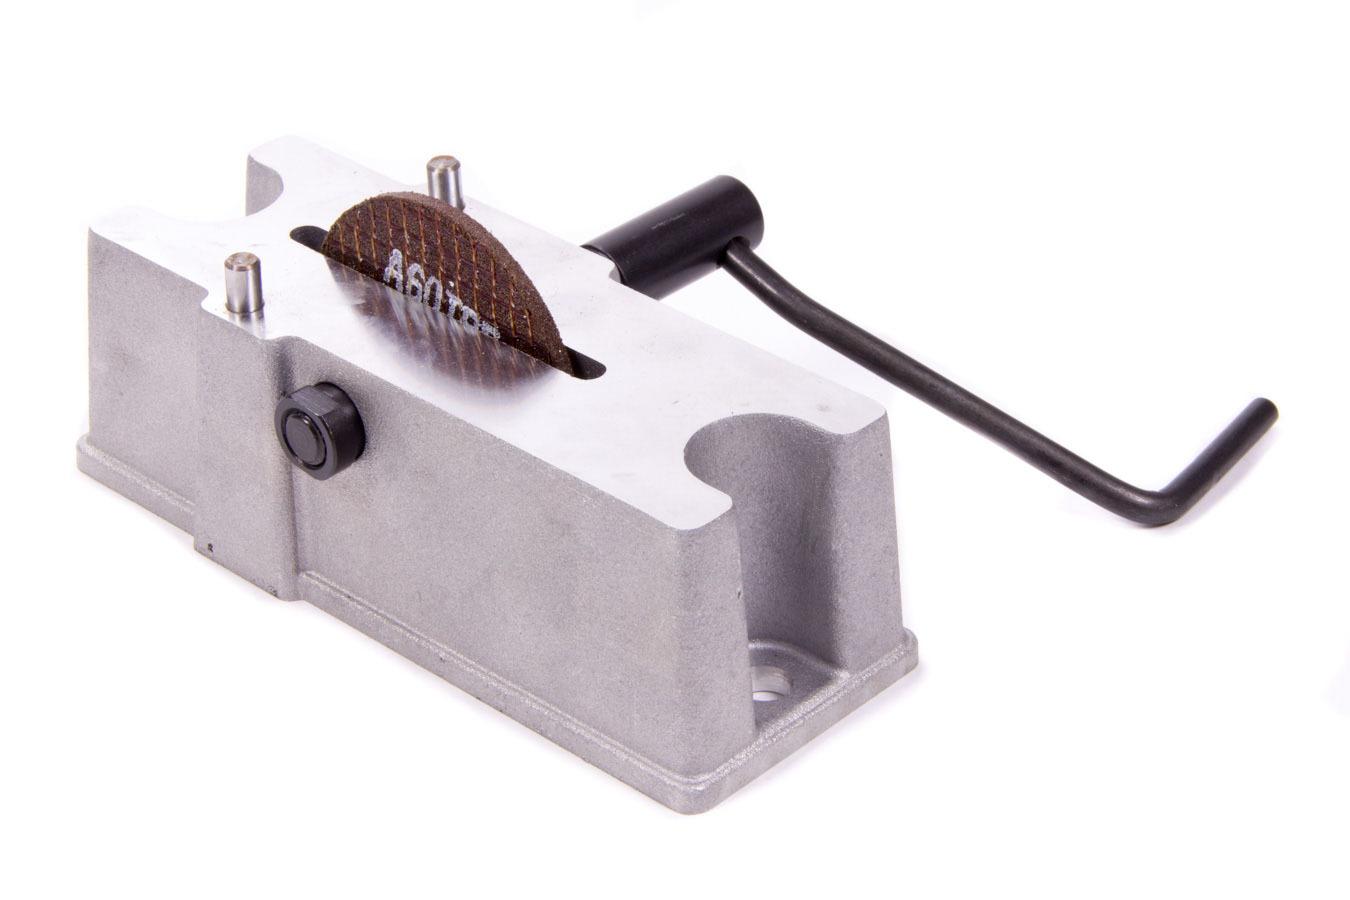 Proform 66785 Piston Ring Filer, Grinding Tool, Manual Crank, Aluminum / Steel, Each